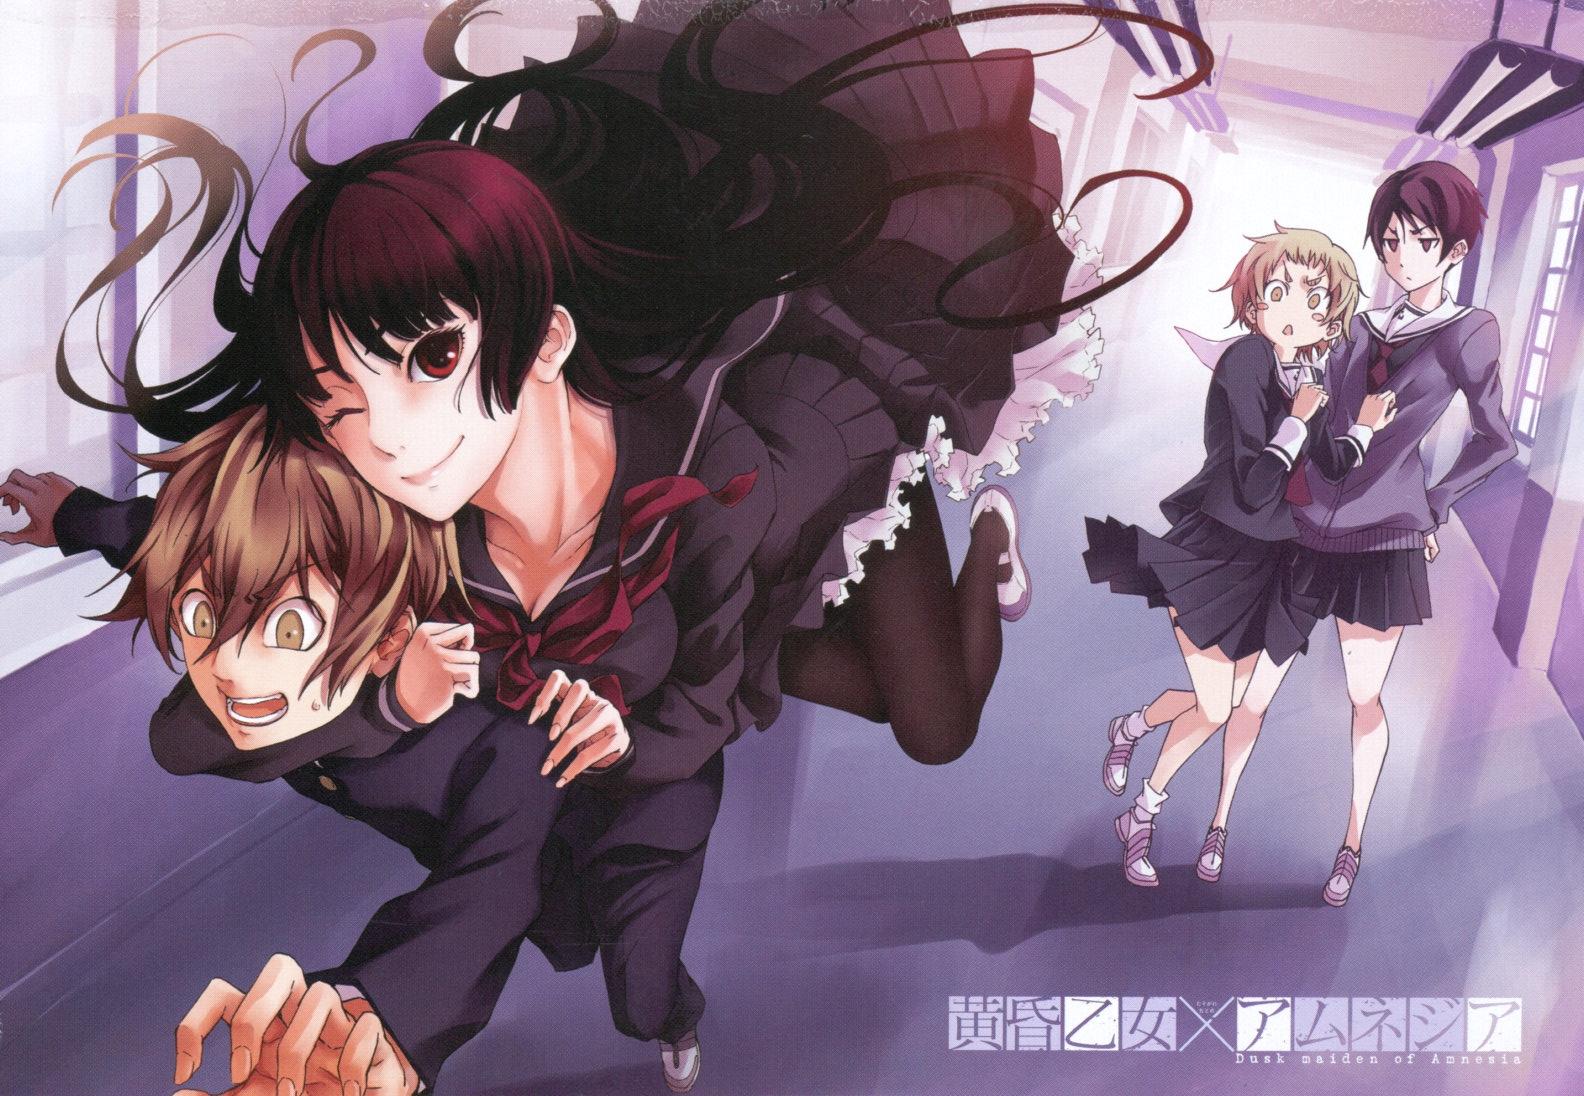 Tasogare Otome X Amnesia Wallpapers Anime Hq Tasogare Otome X Amnesia Pictures 4k Wallpapers 19